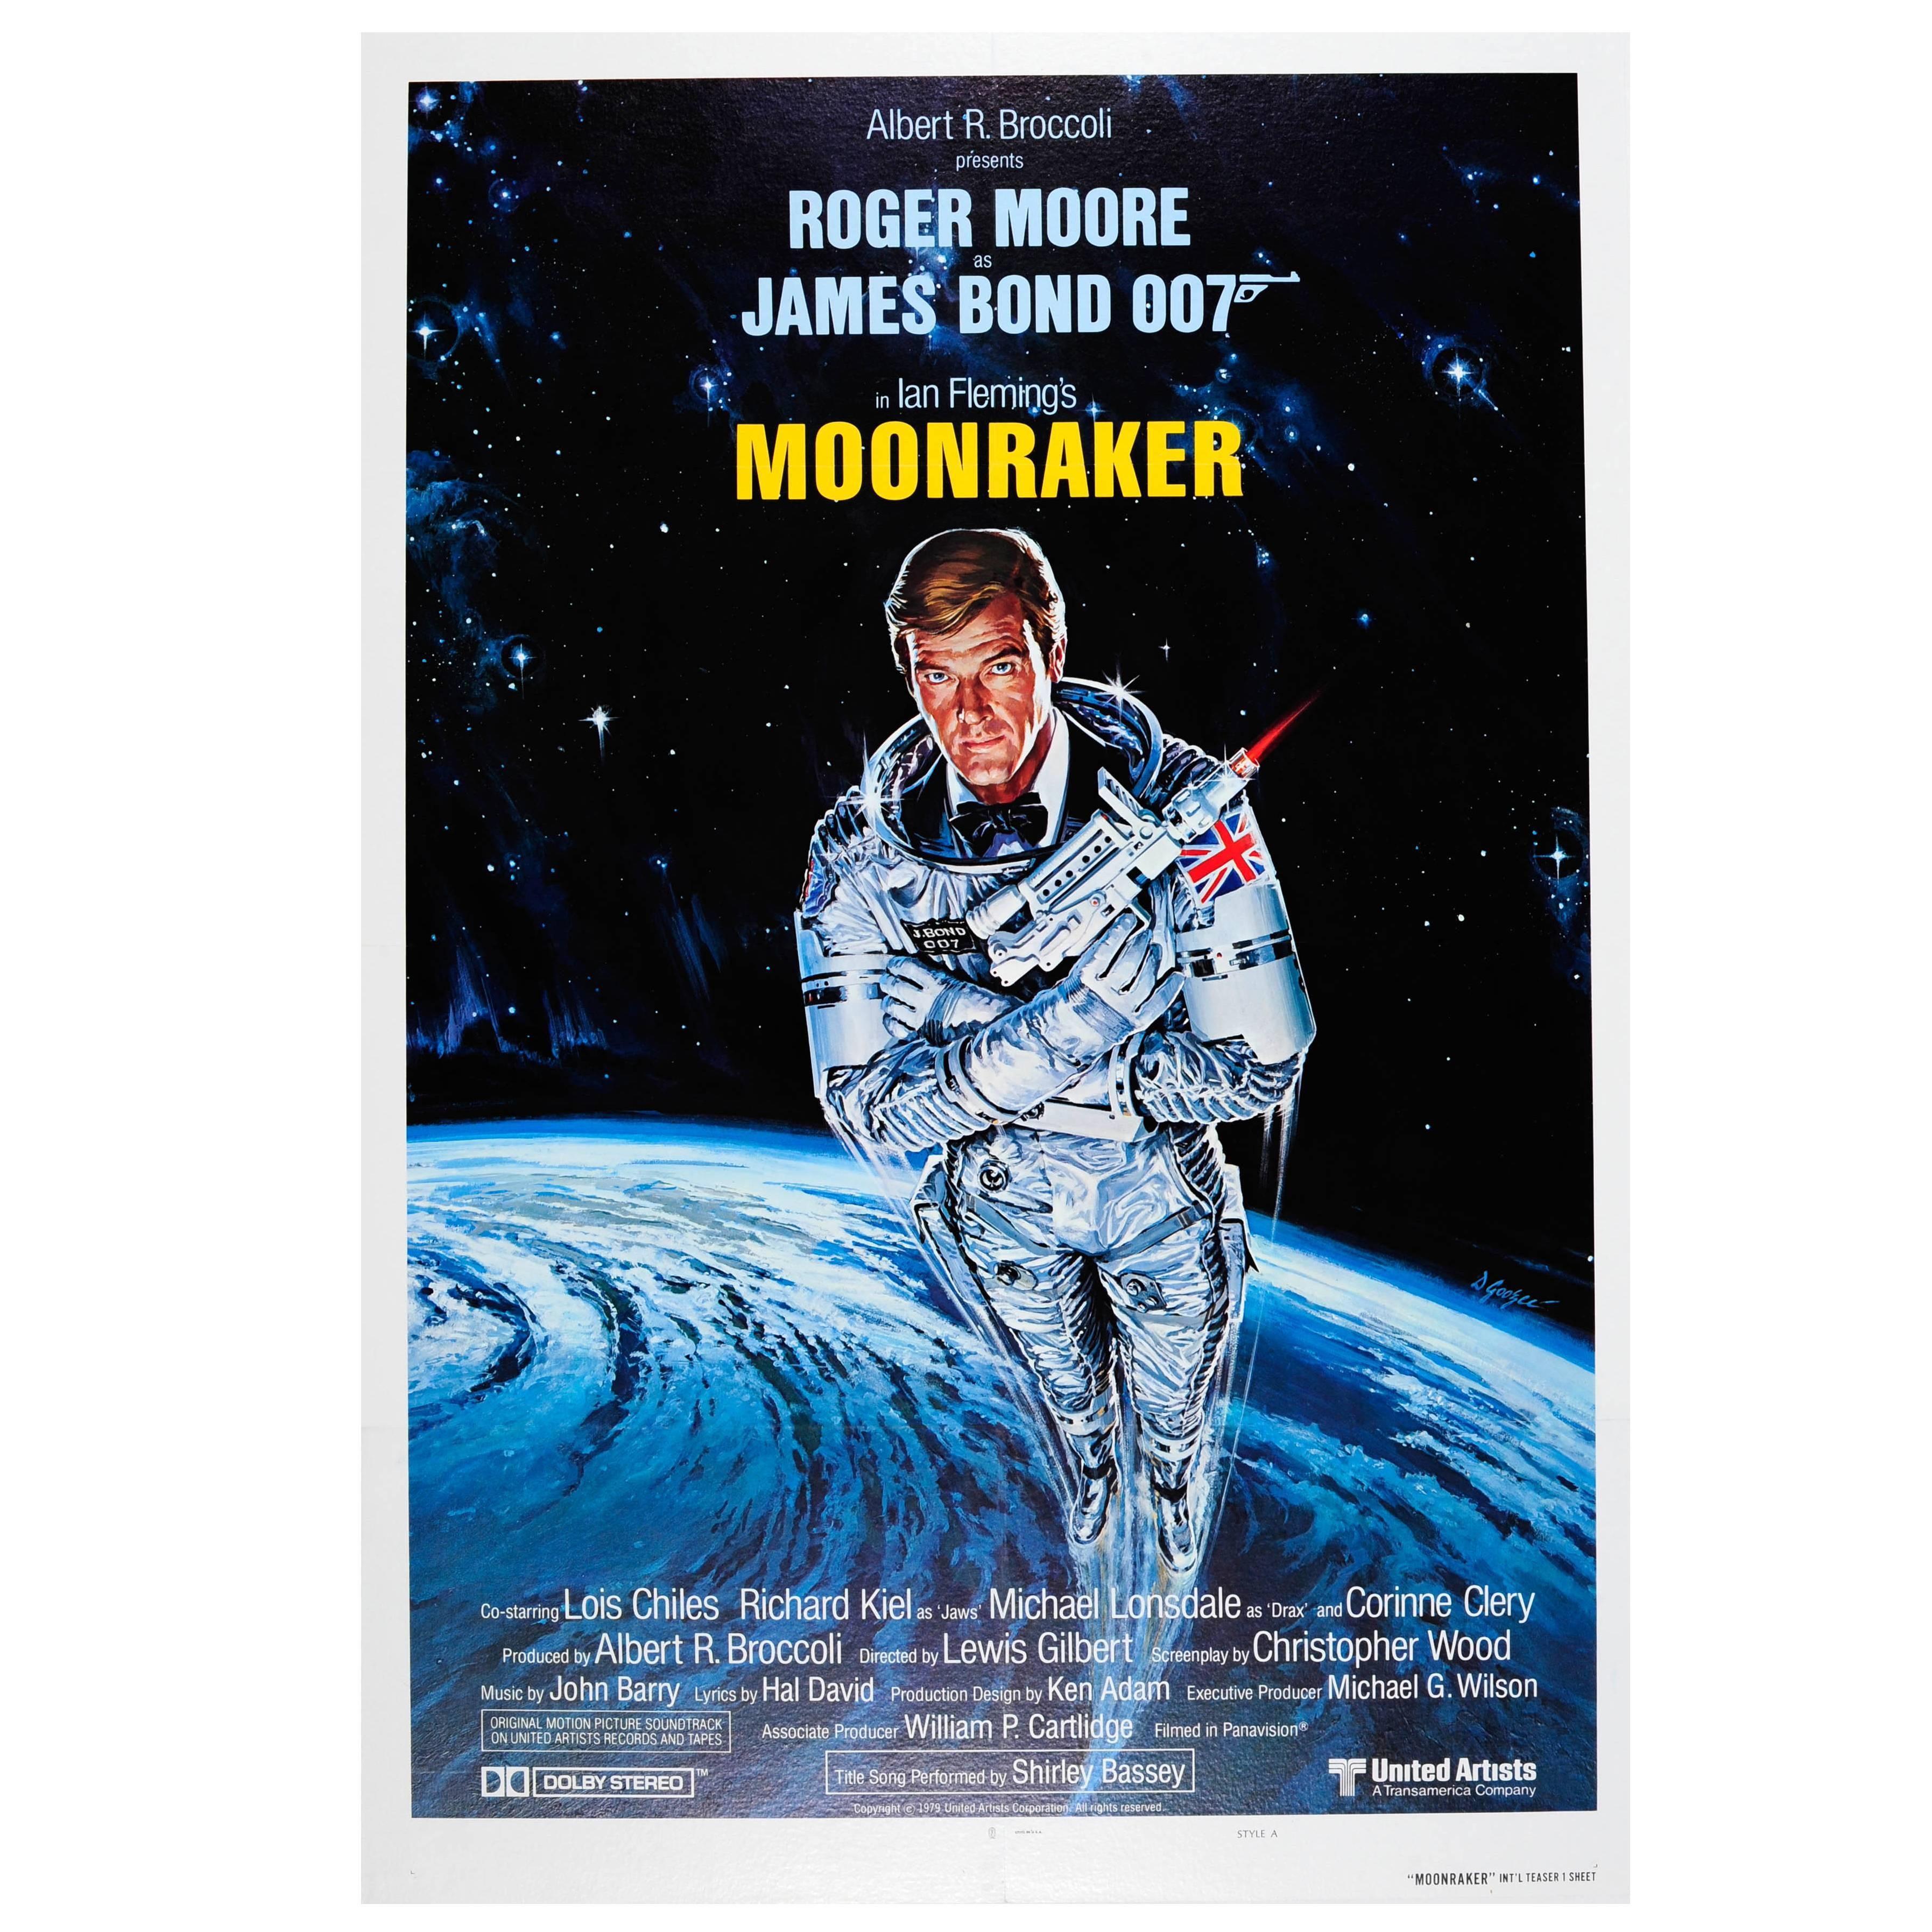 Original Vintage James Bond Poster by Daniel Goozee for the 007 Movie, Moonraker